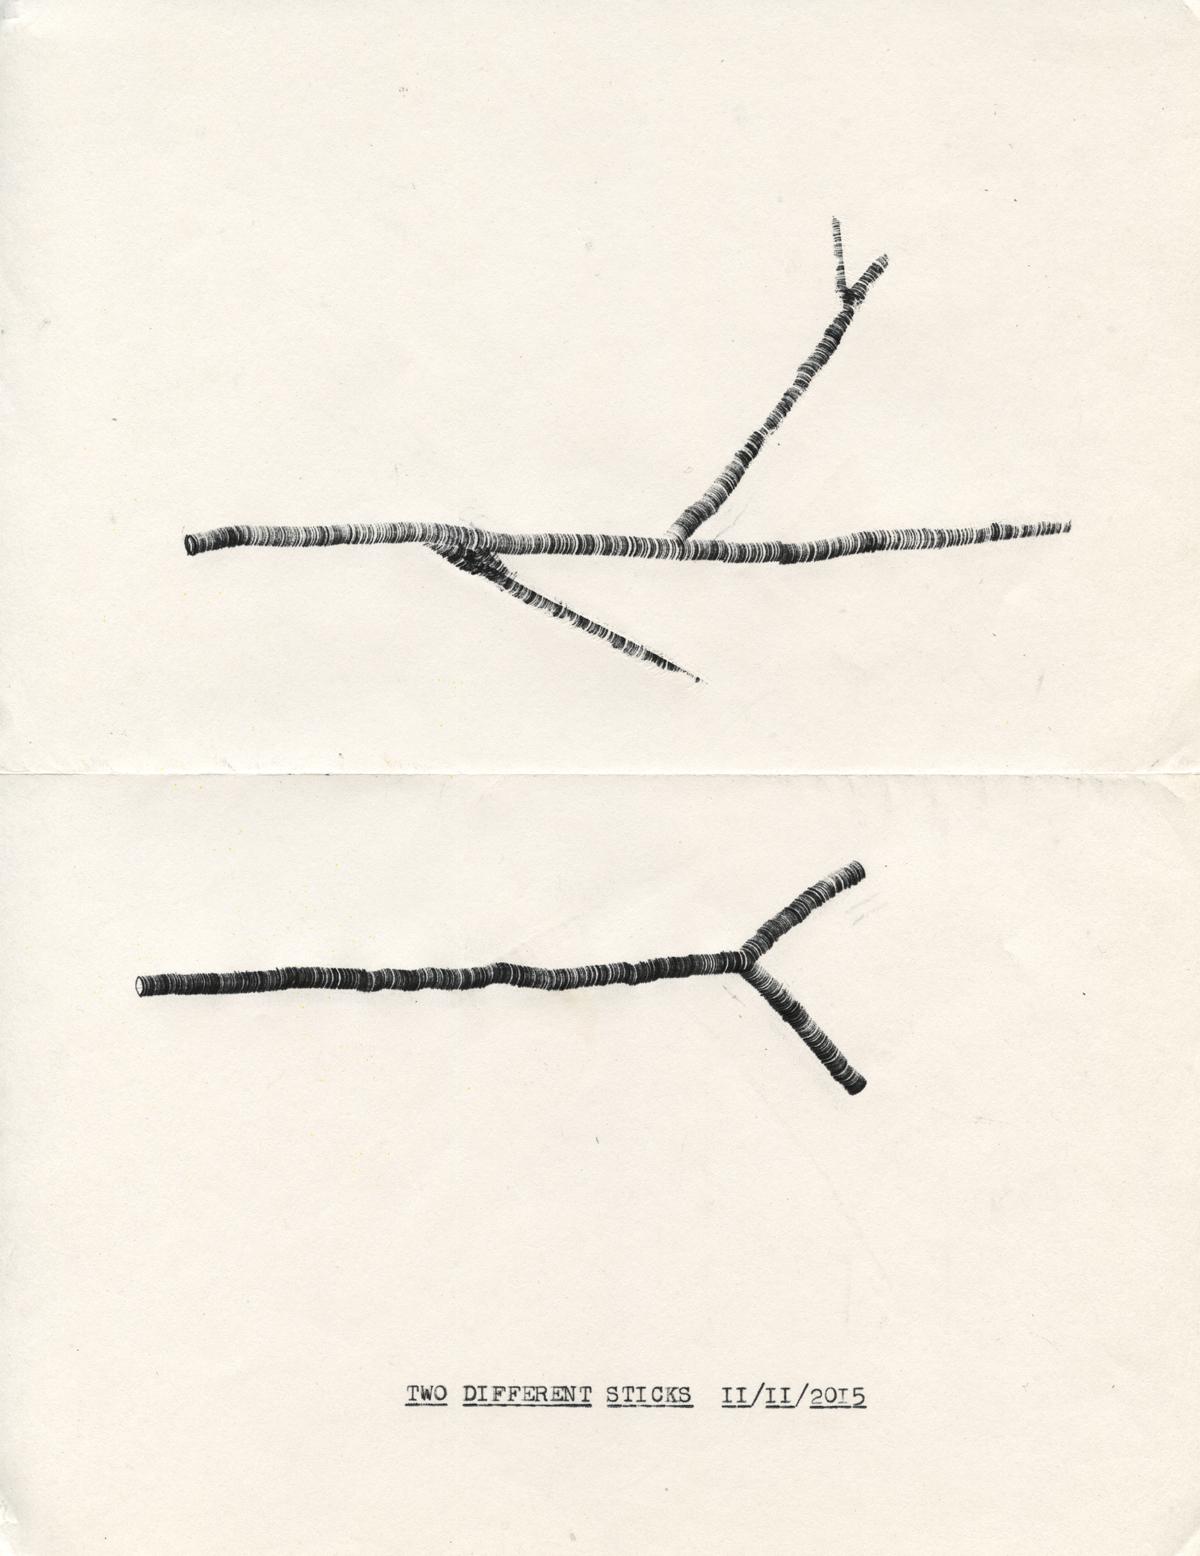 tw_11_11_2015_different_sticks.jpg